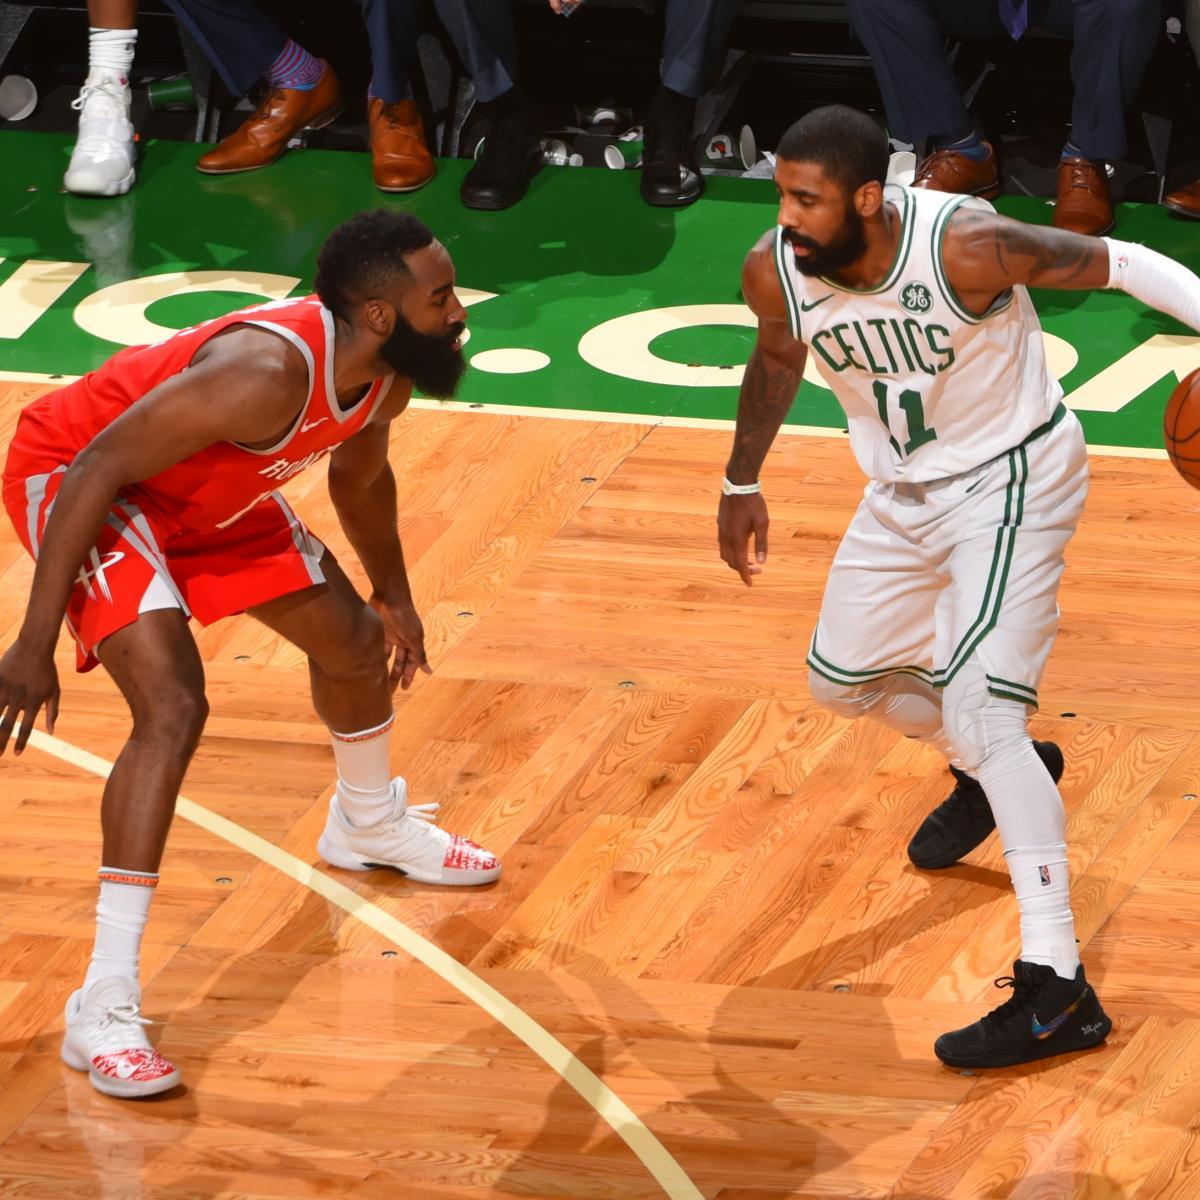 James Harden Offensive Fouls Hand Kyrie Irving, Celtics ...